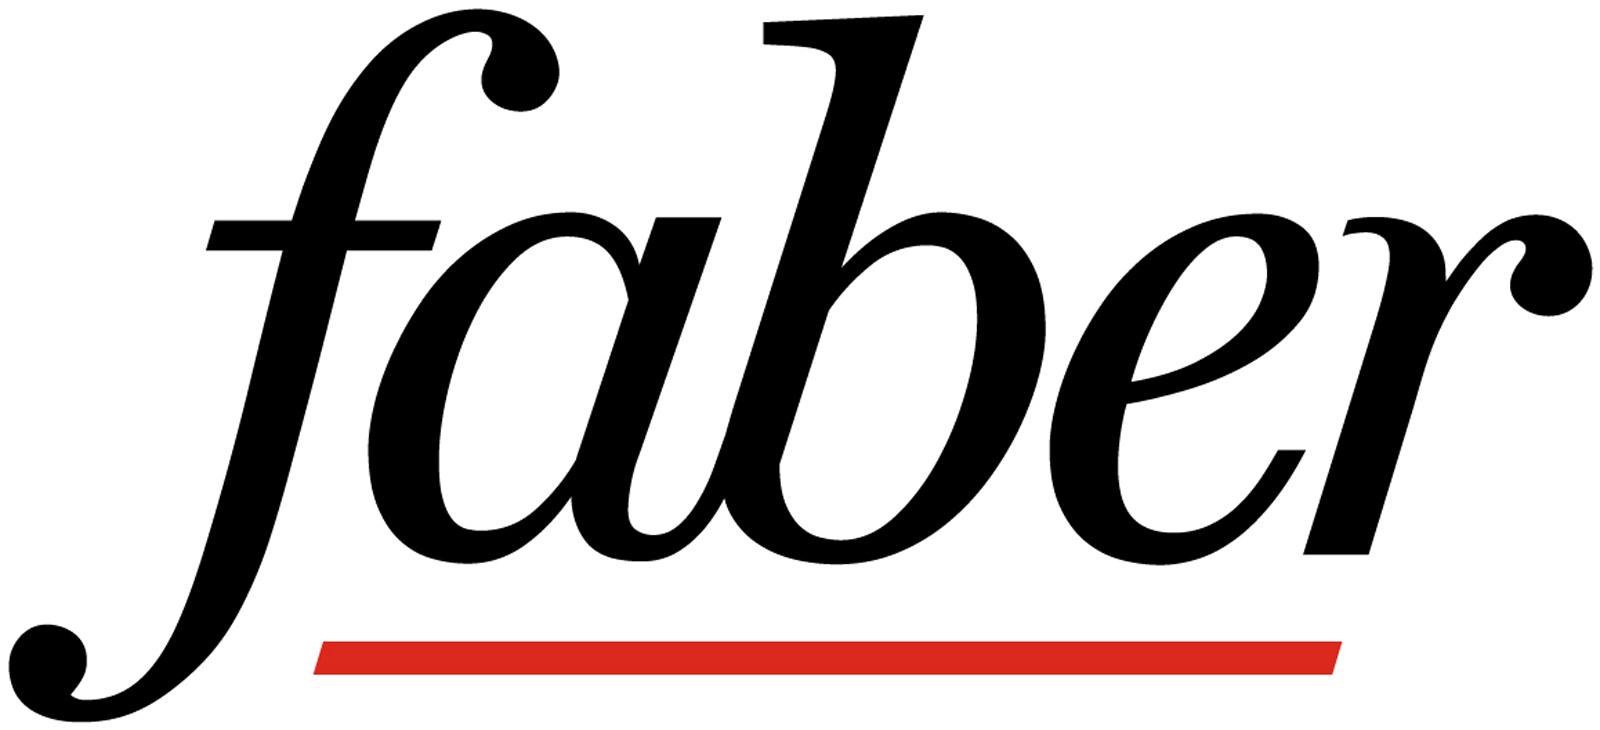 Faber Logo High Res.jpg